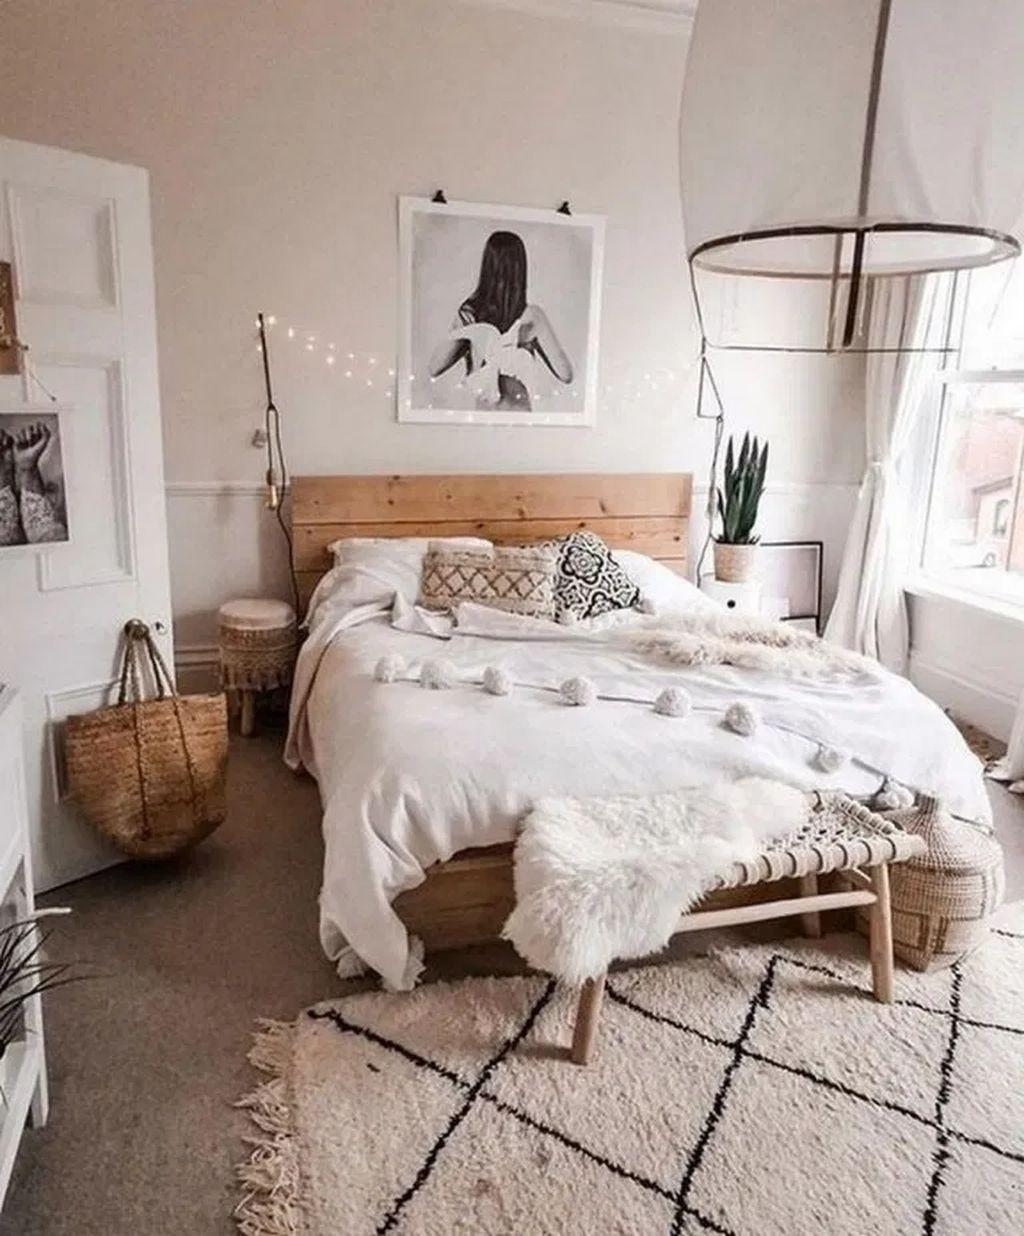 30 Top Minimalist Bedroom Interior Design Ideas For Your Inspiration Simple Bedroom Bedroom Inspiration Boho Minimalist Bedroom Design